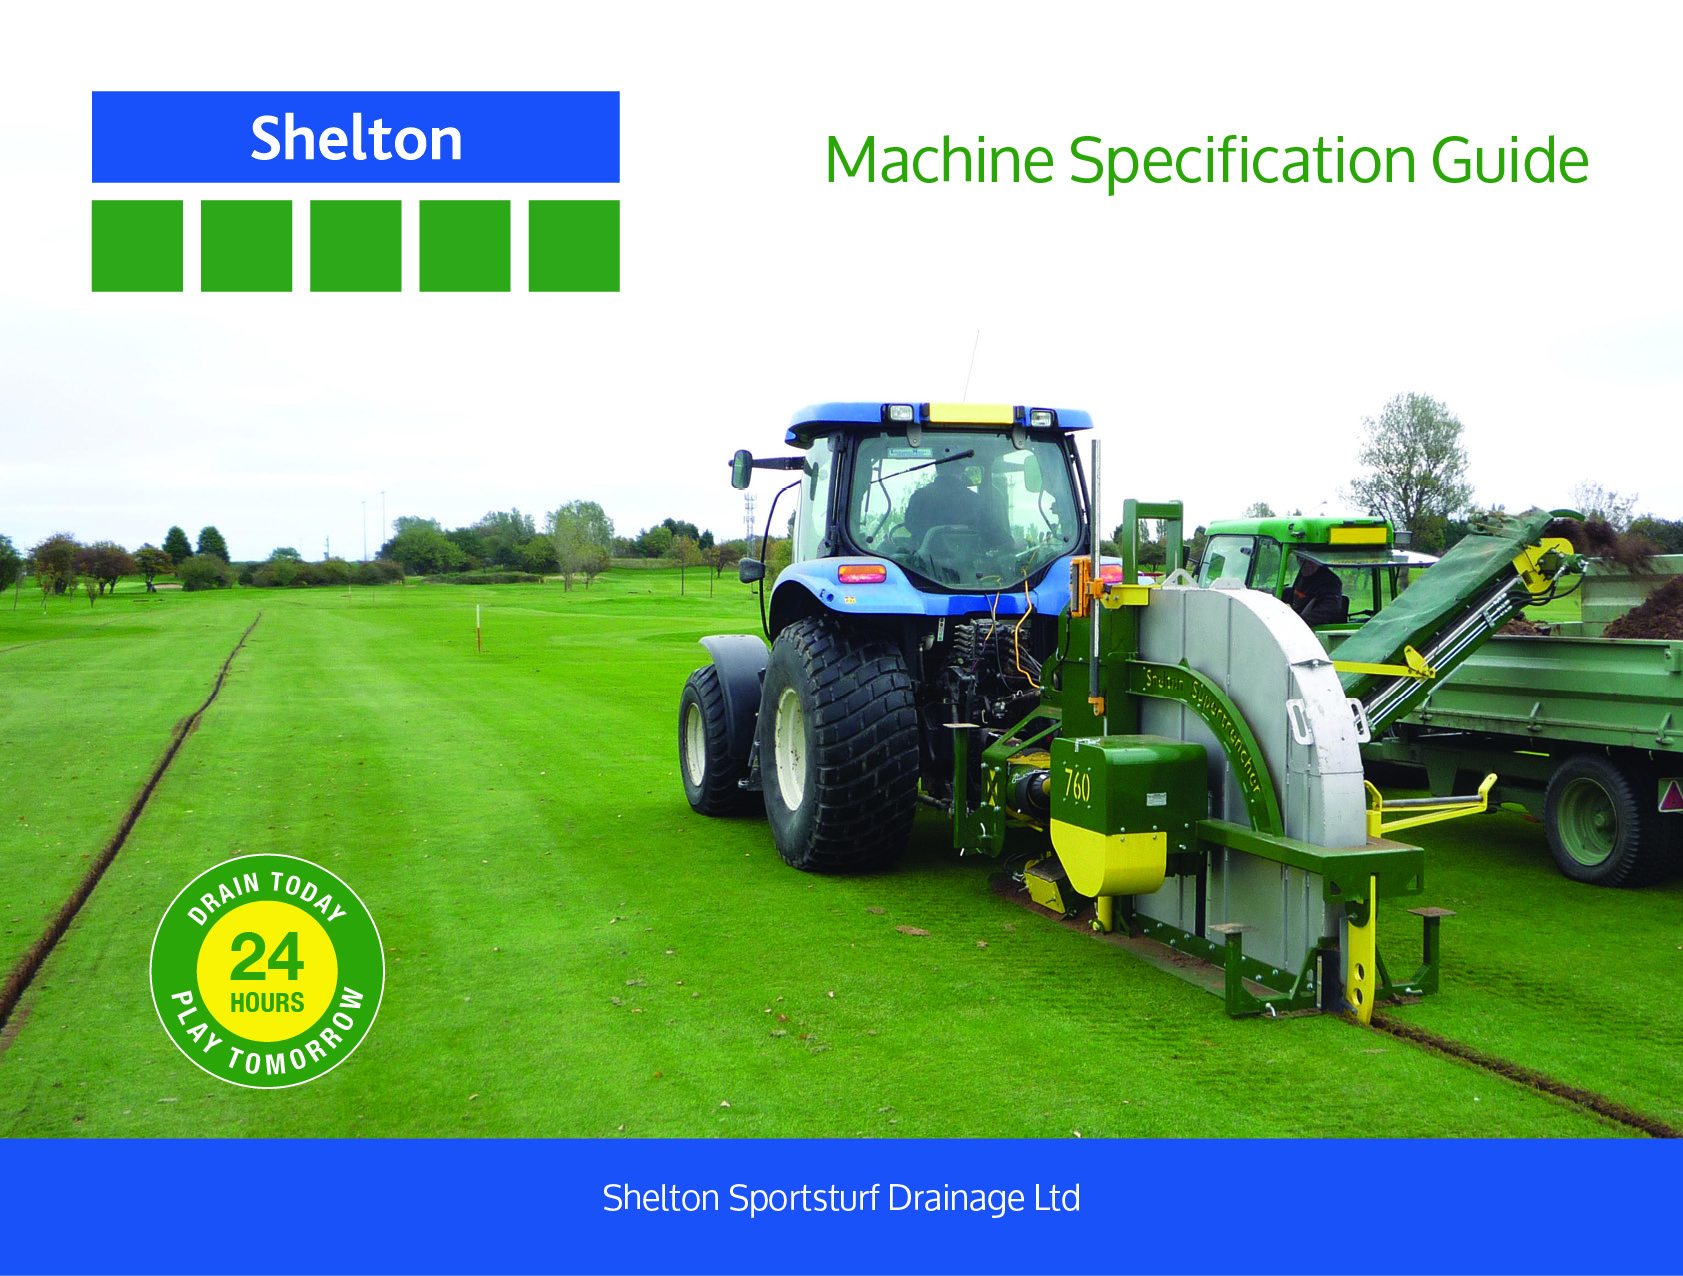 Thumbnail for Shelton Sportsturf Machine Specification Guide